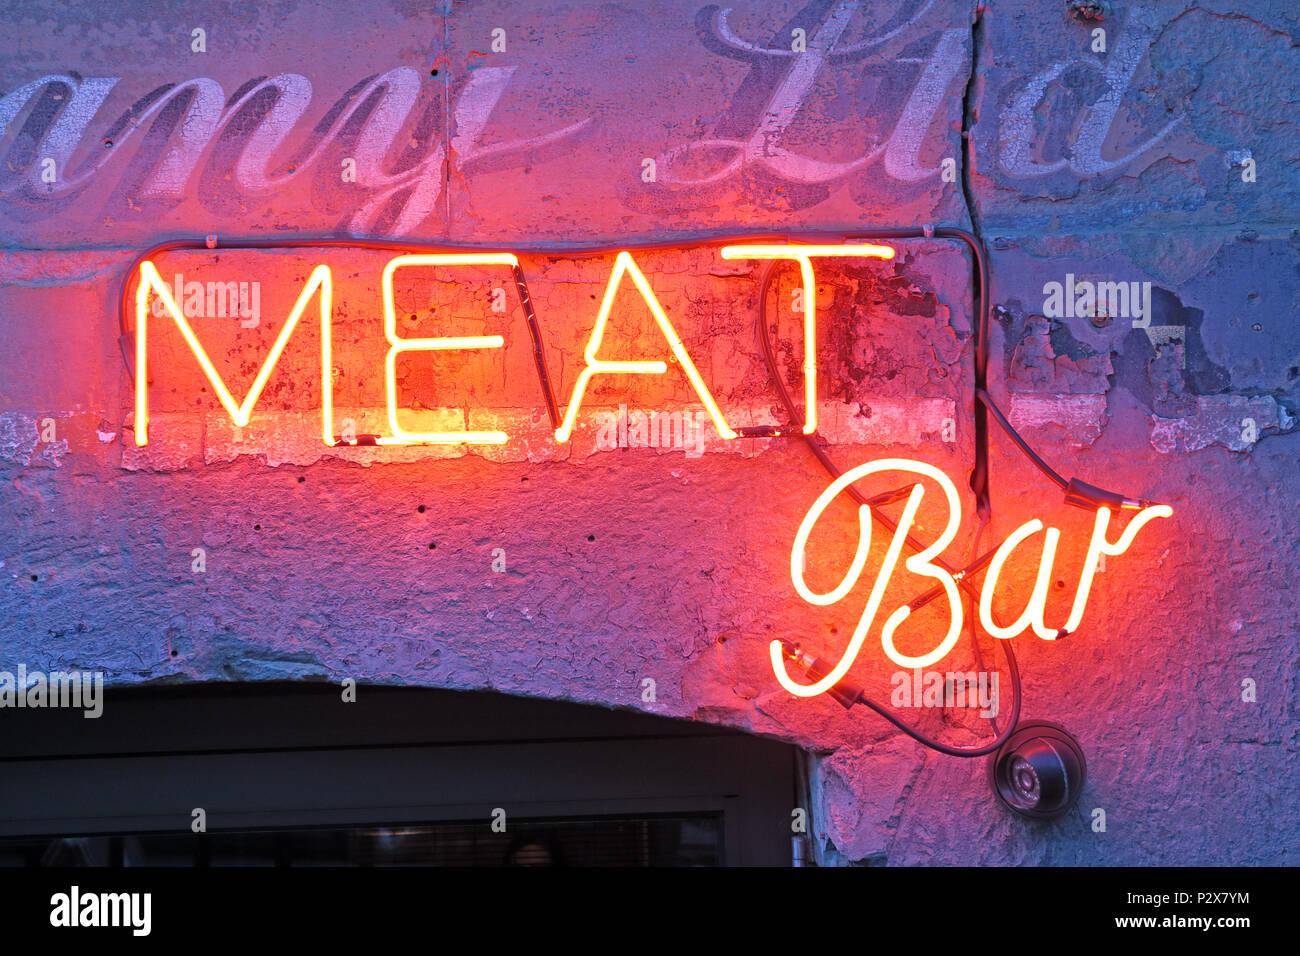 GoTonySmith,@HotpixUK,Meat,West Regent Street,West Regent St,G2,G2 2RQ,eating,neon,sign,pork,beef,chicken,meats,steak,ribeye,rib-eye,sirloin,rump,fillet,Tbone,t-bone,roast,roasted,lean,charred,tenderloin,Scottish beef,cows,Scots,Scotland,eats,too much meat,meat diet,cancer,risk,meat eaters,giving up meat,becoming vegetarian,turning vegan